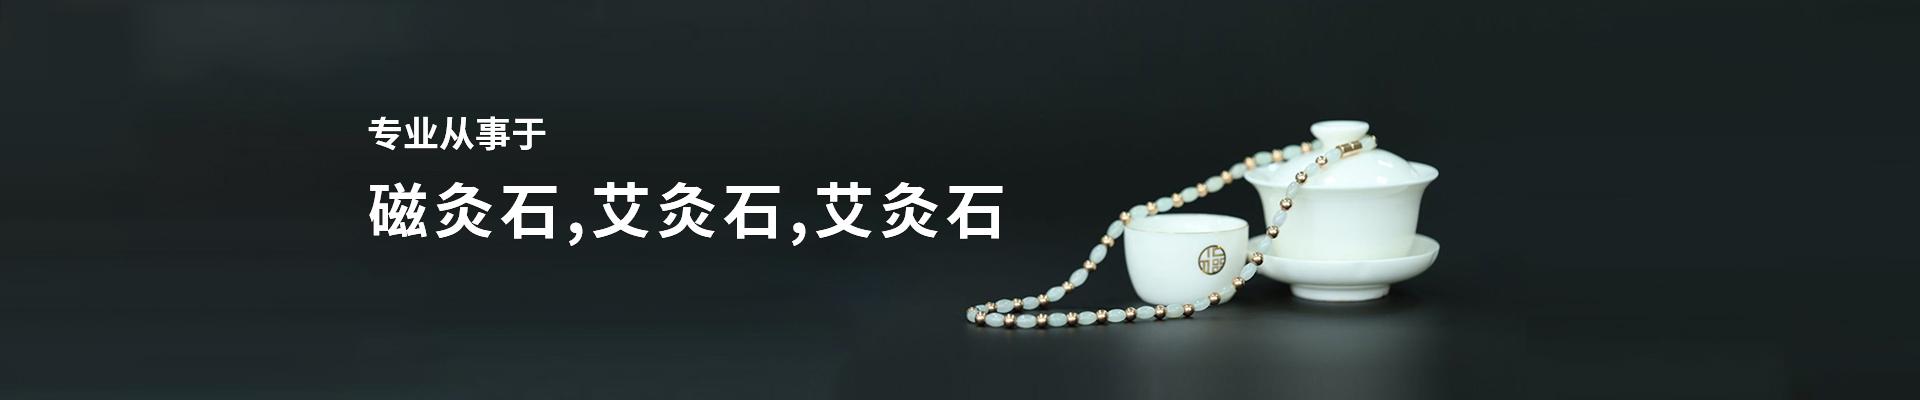 http://www.nbguorui.com/data/upload/202006/20200618144602_225.jpg